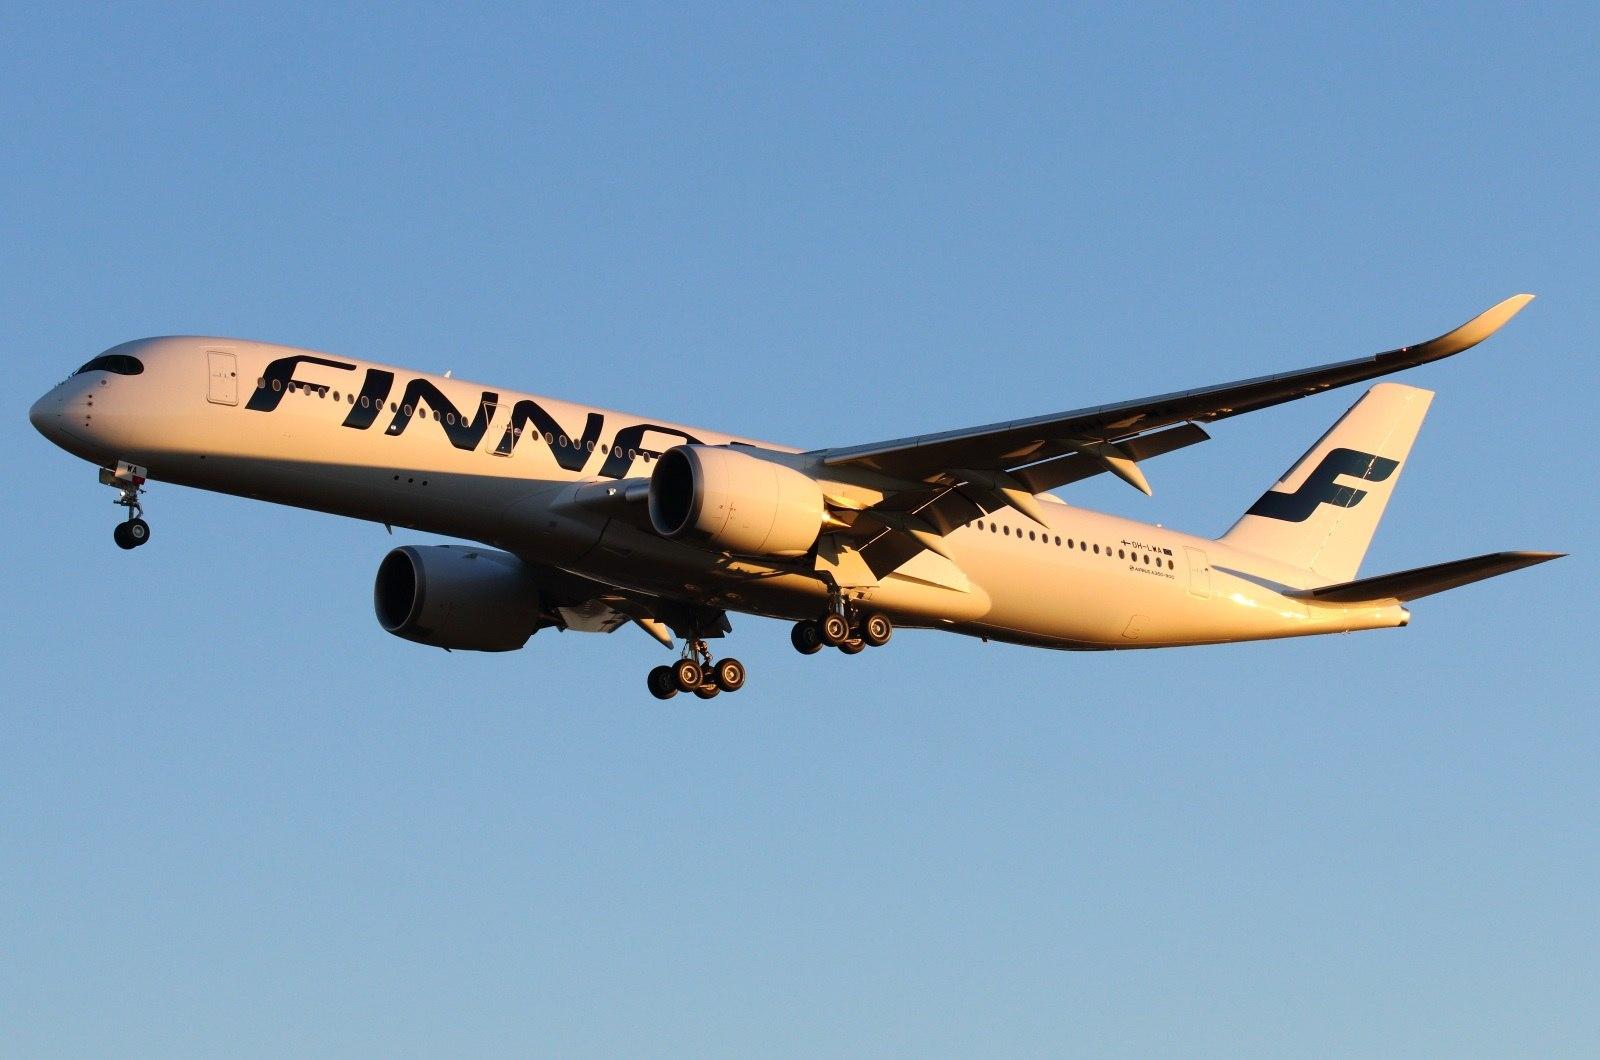 Лайнер Finnair в воздухе